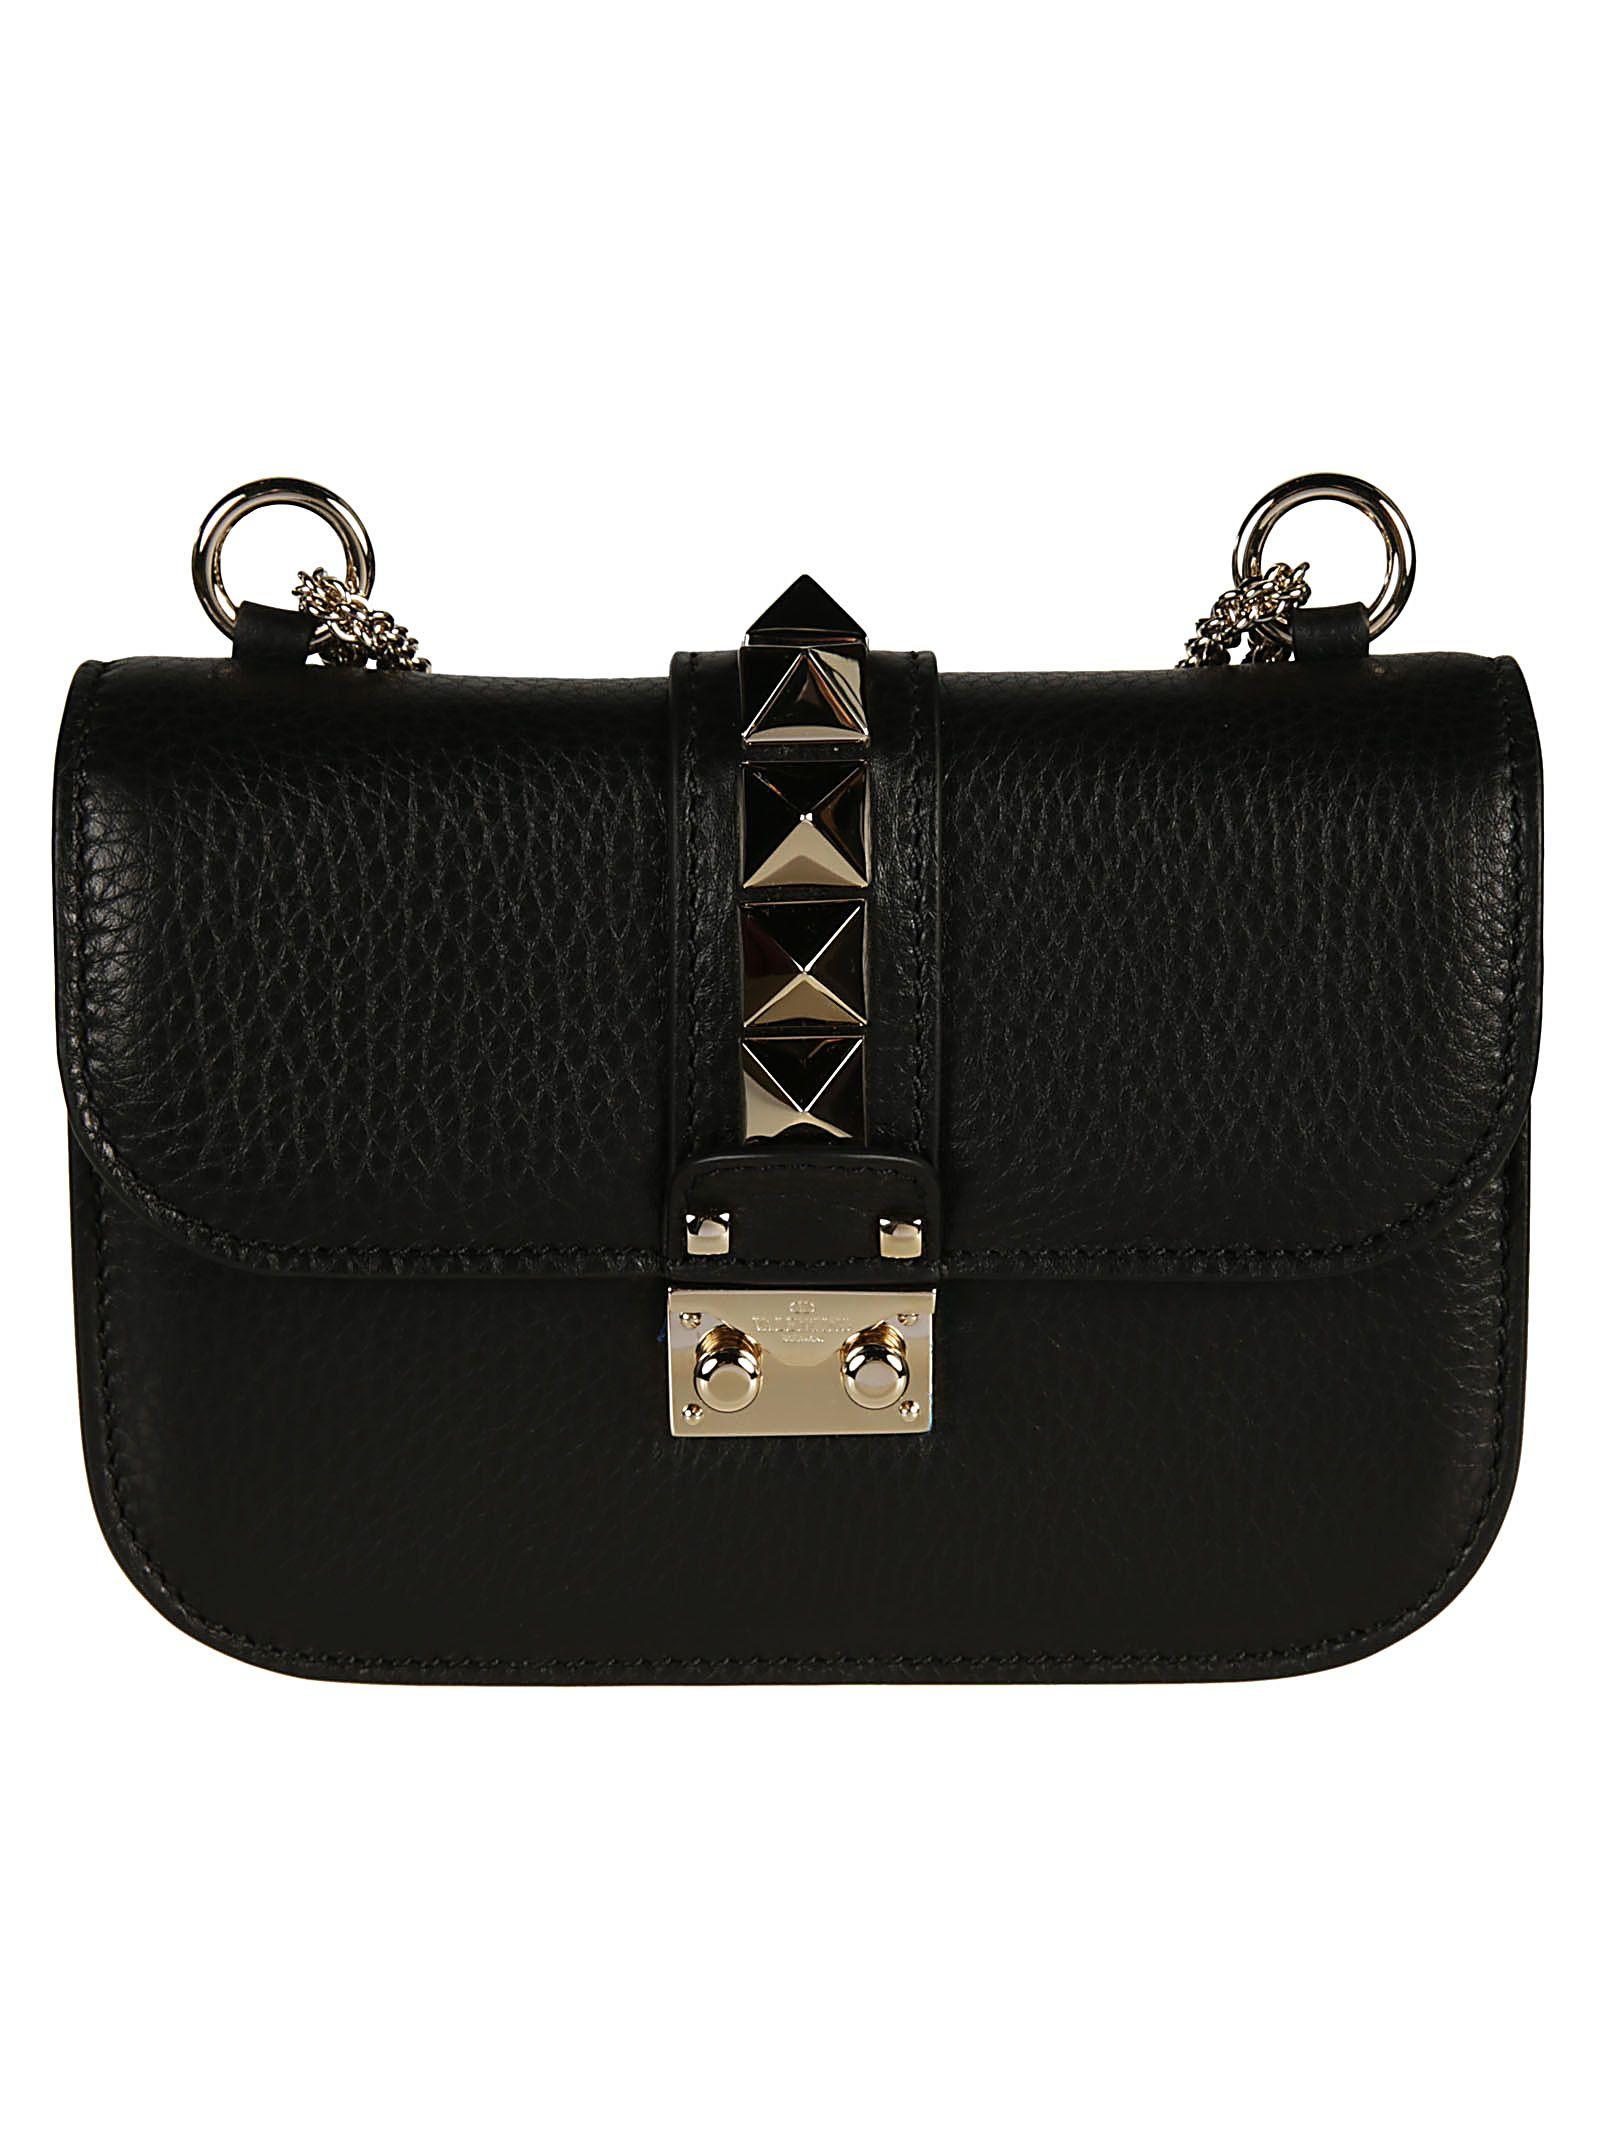 Valentino Garavani Mini Glam Lock Shoulder Bag